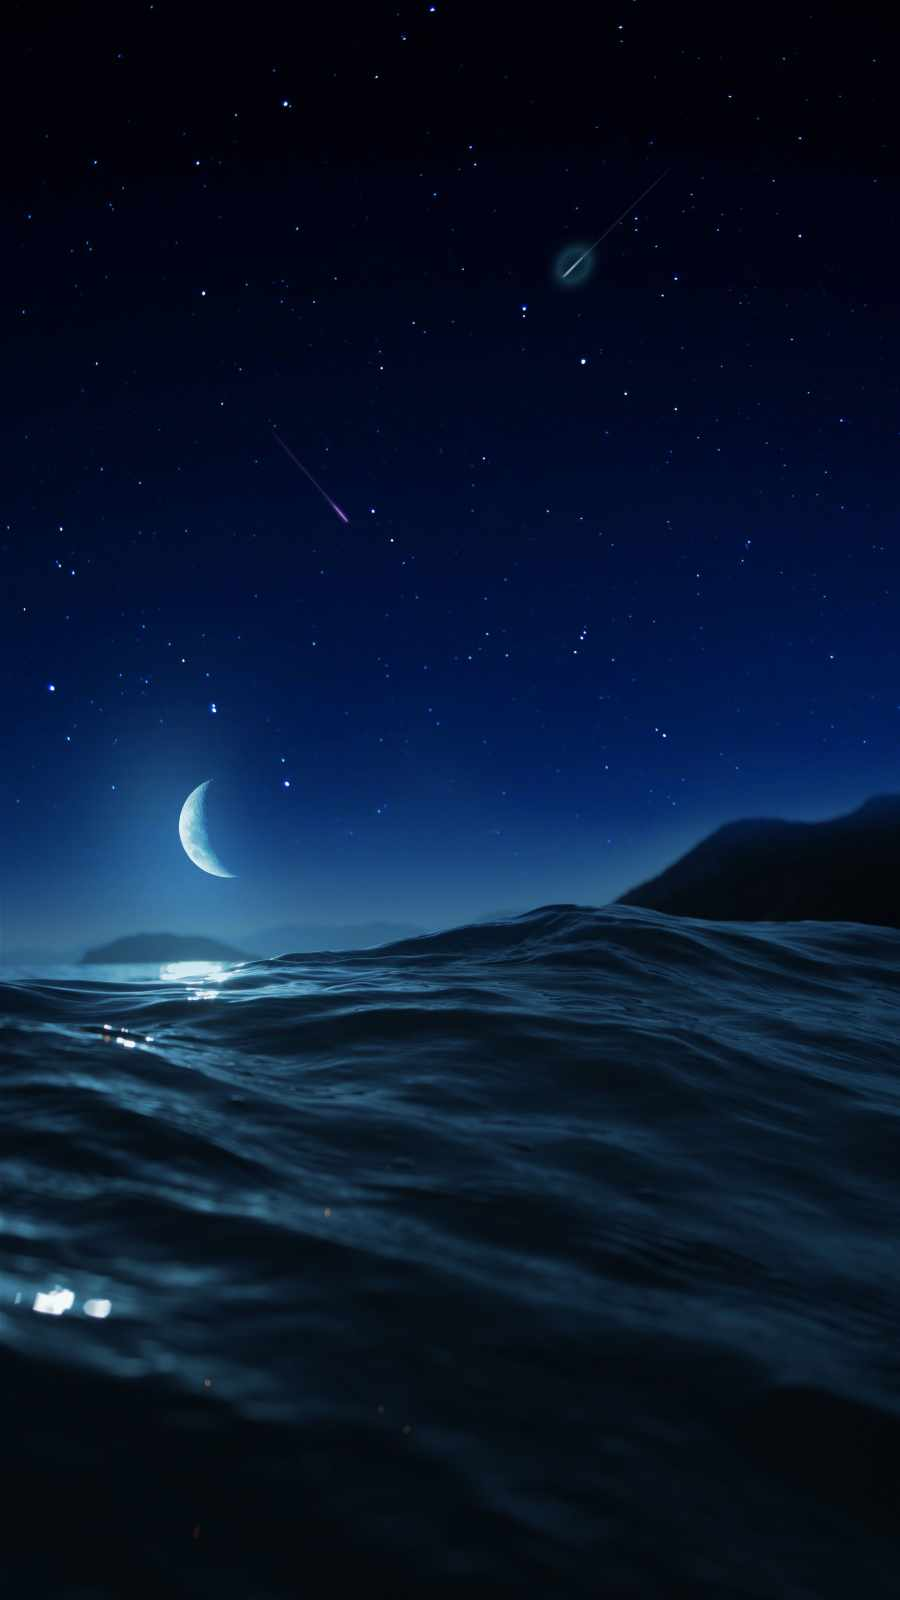 Ocean Night iPhone Wallpaper